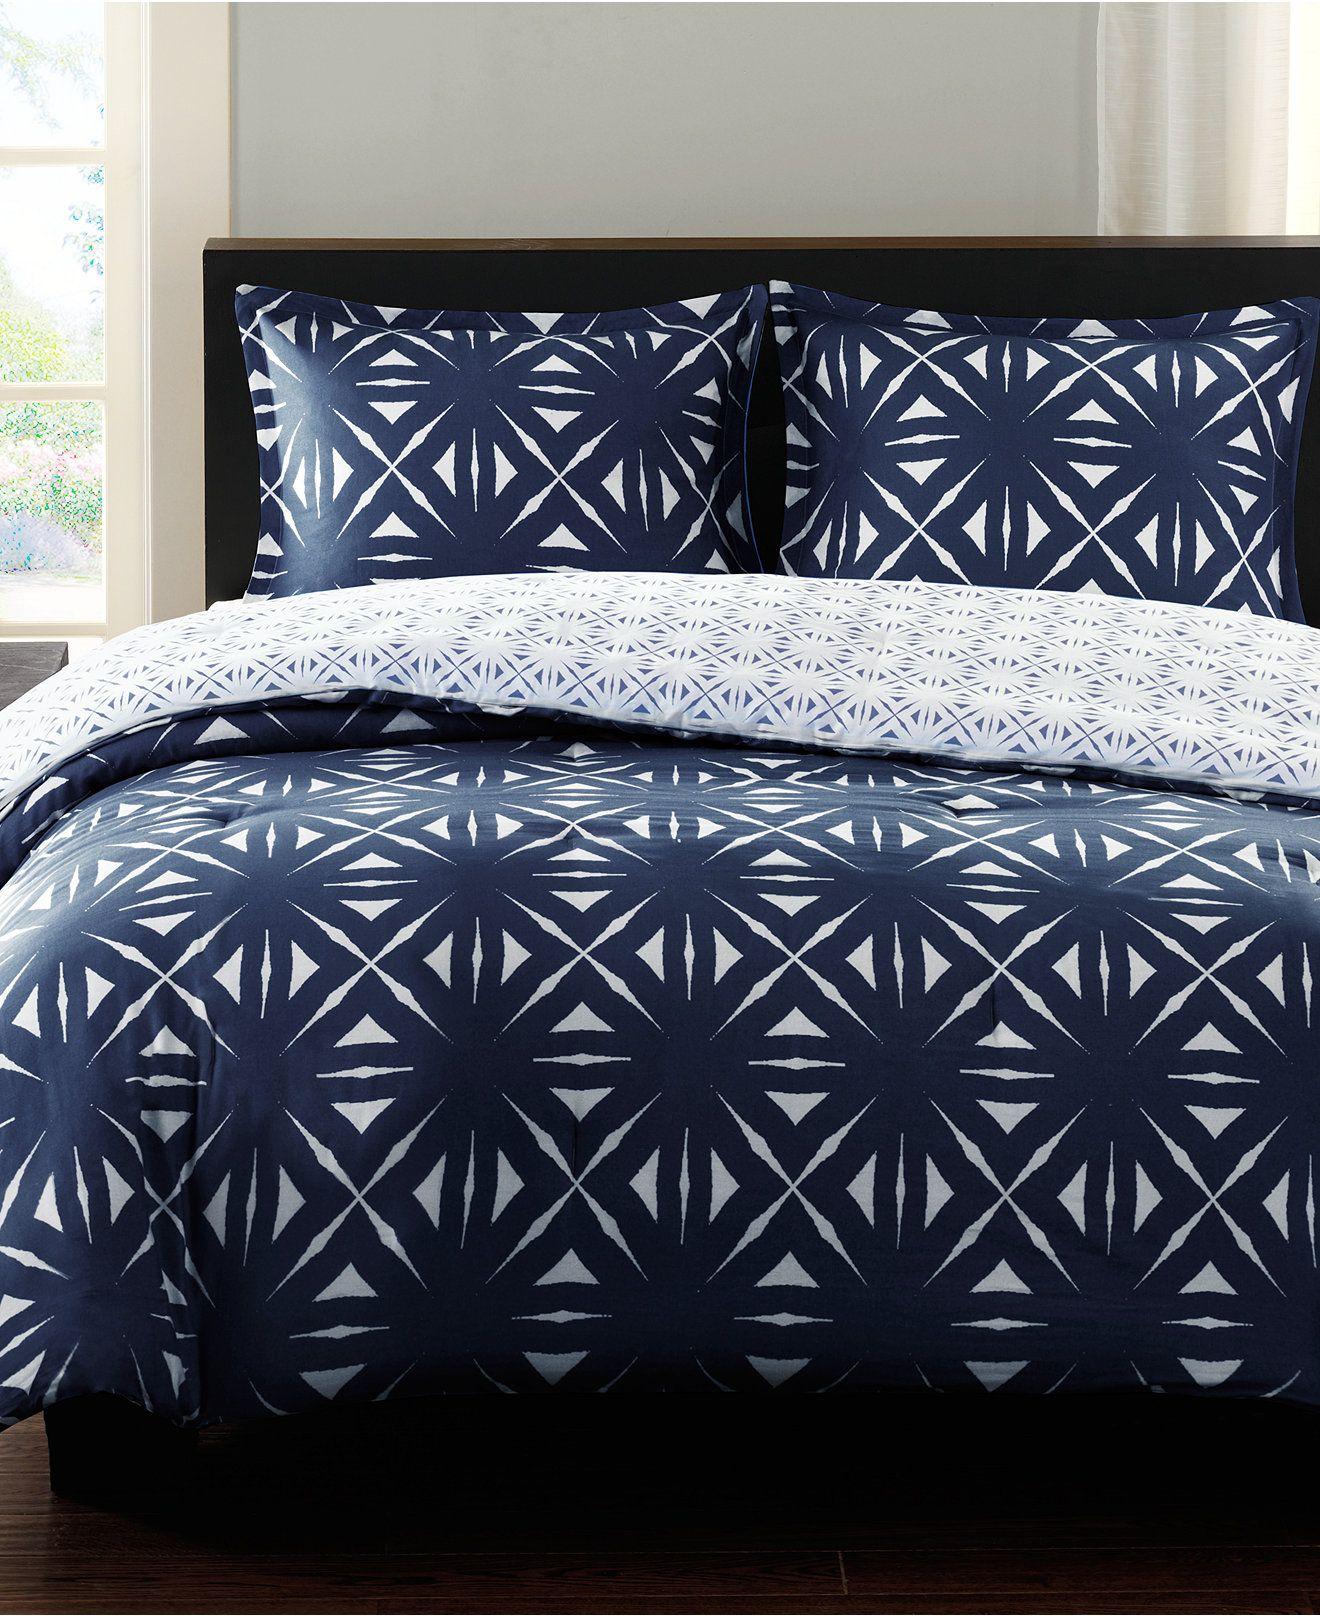 Echo Lattice Geo Colony Blue forter Mini Sets Bedding